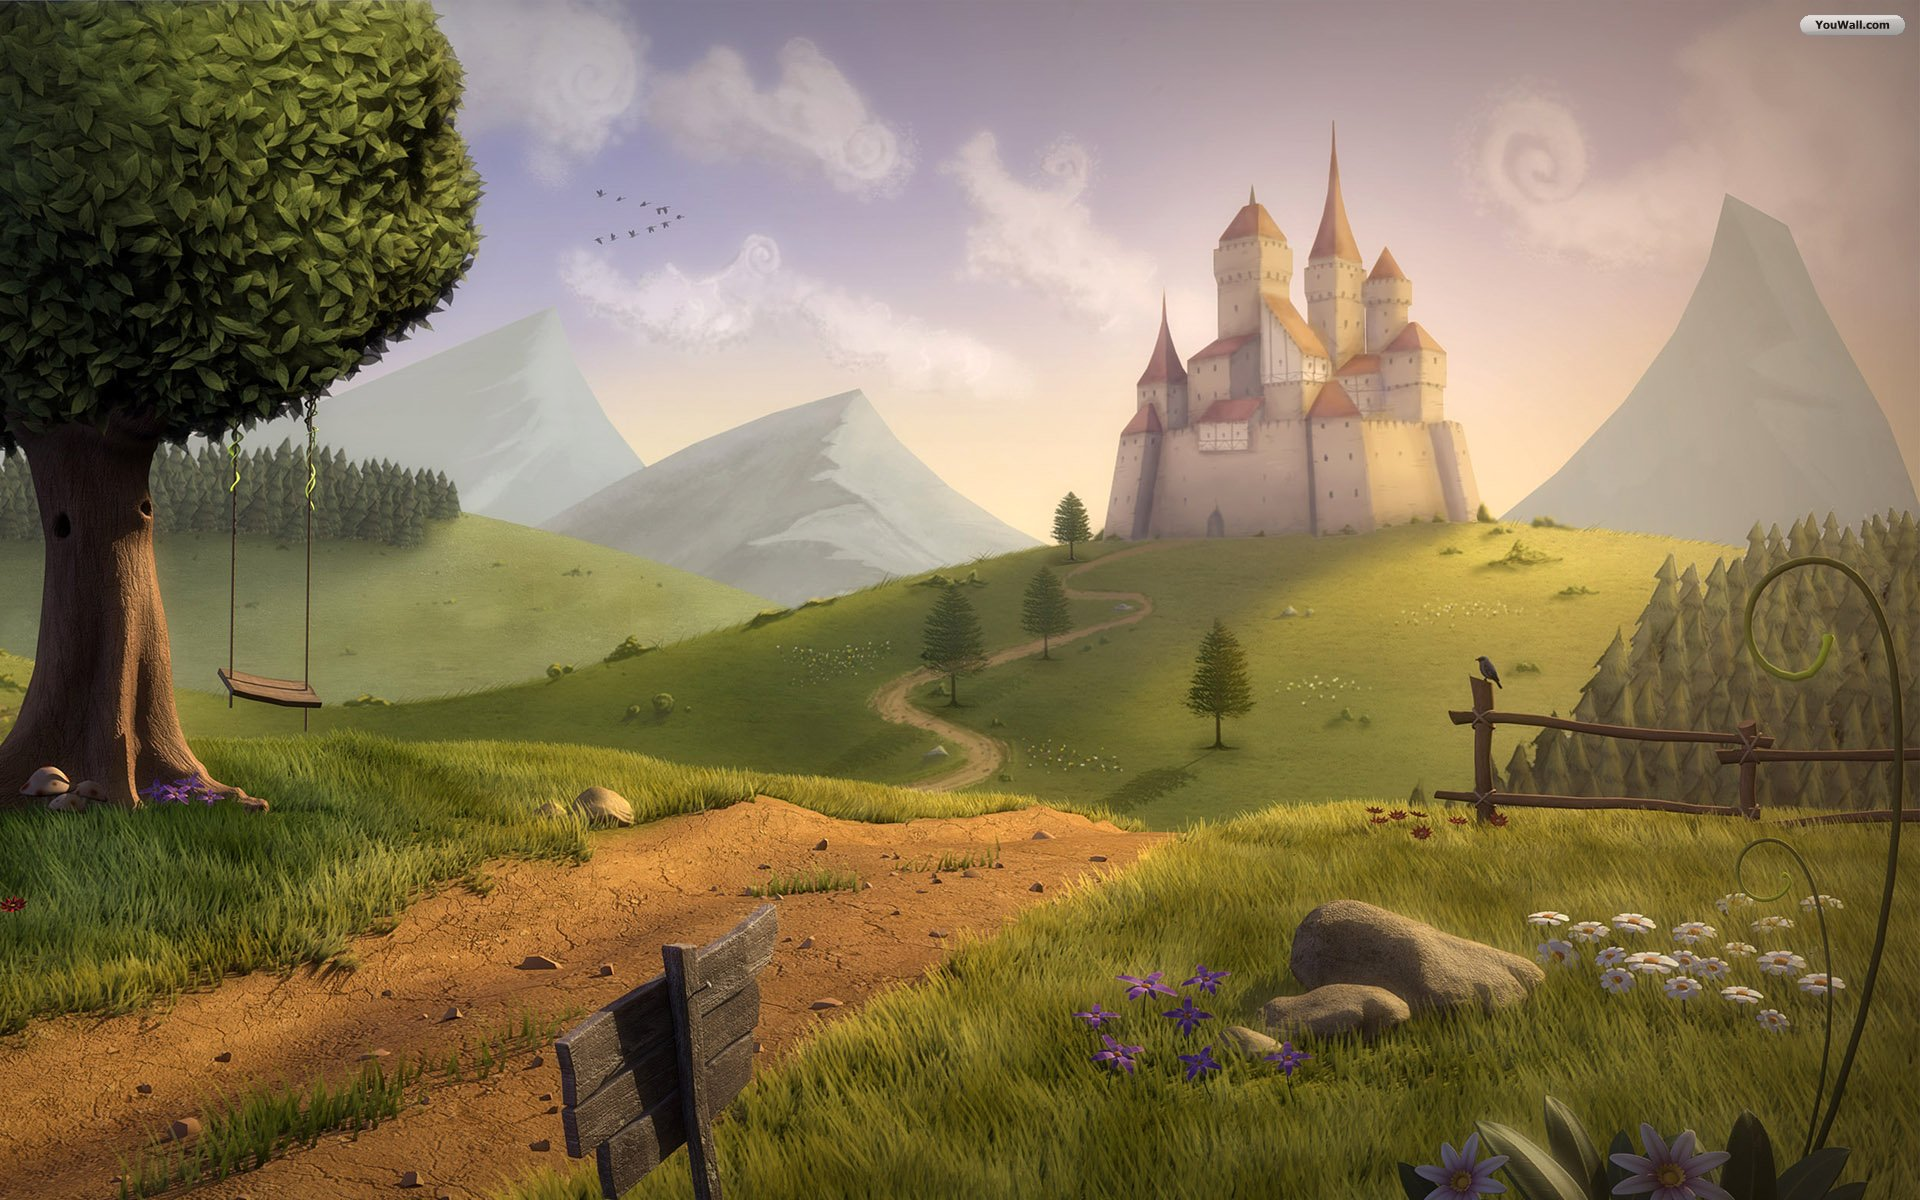 Fantasy Castle wallpaper   340163 1920x1200